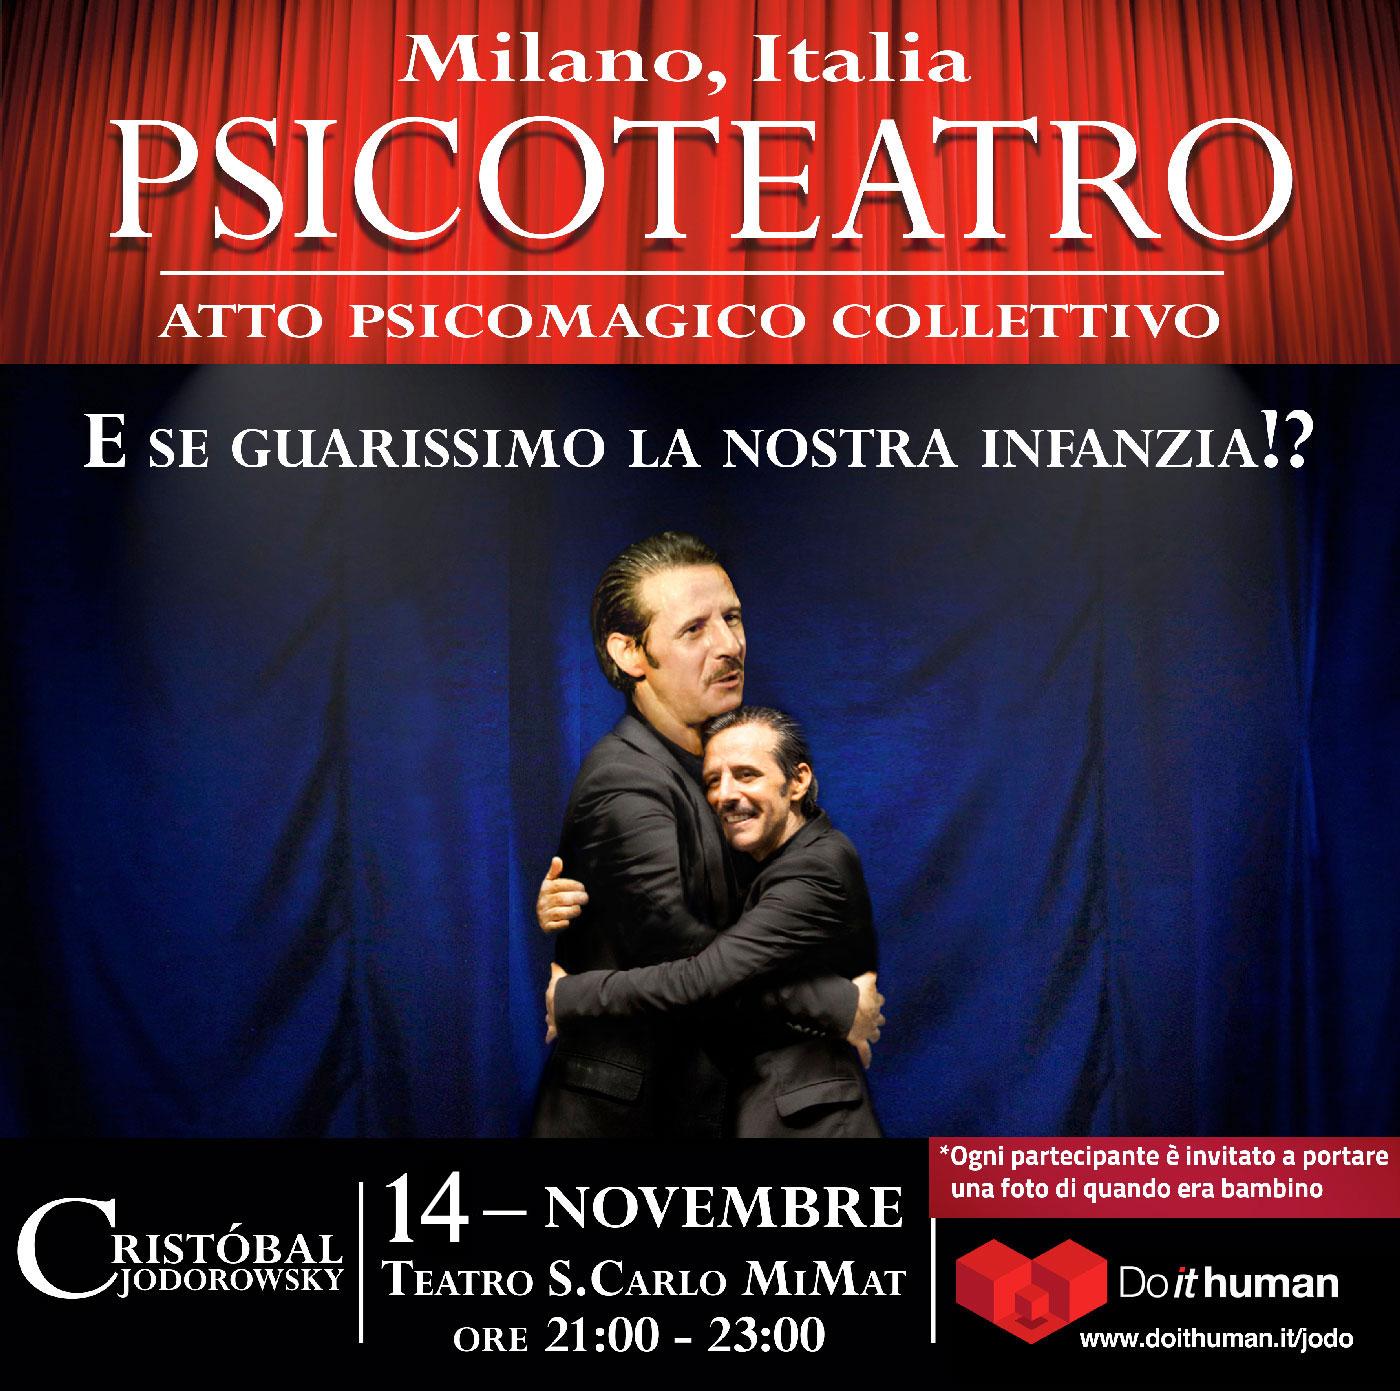 psicoteatro-banner-milano14-11-2016